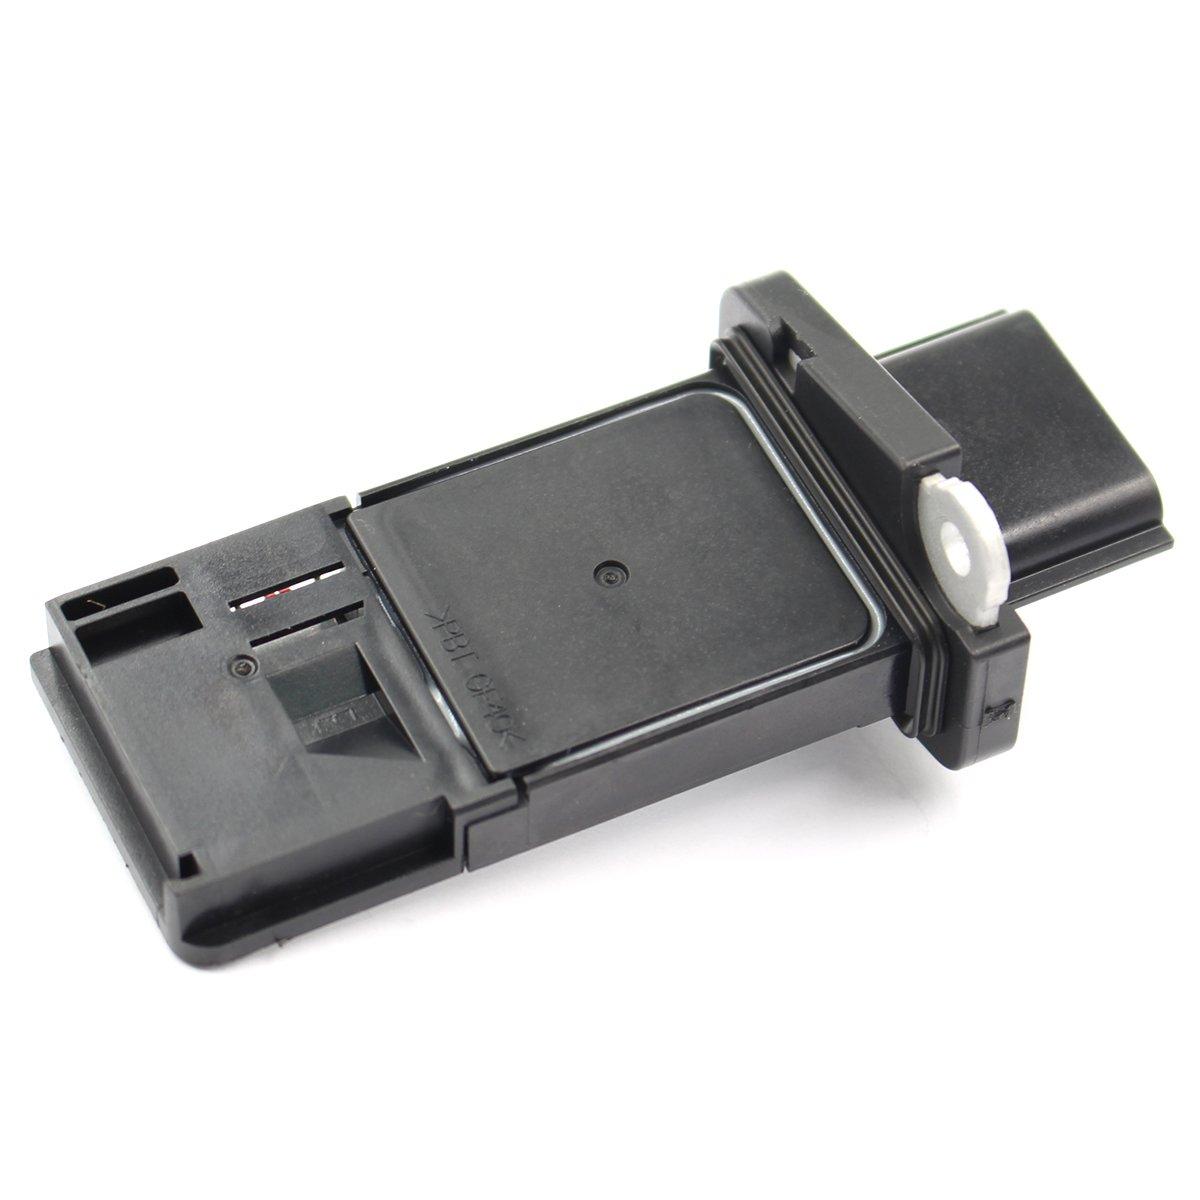 AUTOKAY Mass Air Flow Sensor 22680-7S000 for Nissan Infinity Suzuki